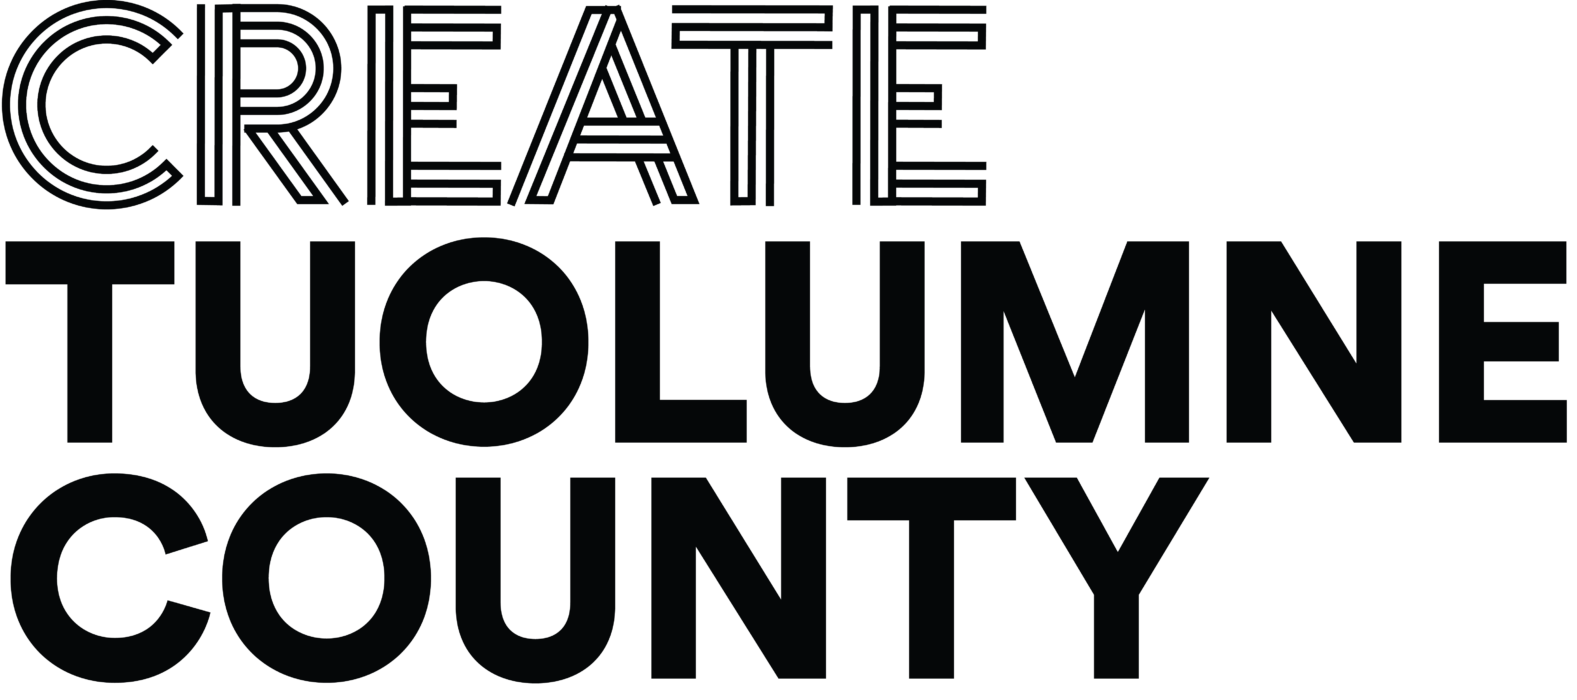 https://secureservercdn.net/198.71.233.51/mgq.552.myftpupload.com/wp-content/uploads/2020/01/Create-Ca-County-Logos-52-e1580495863982.png?time=1586334232